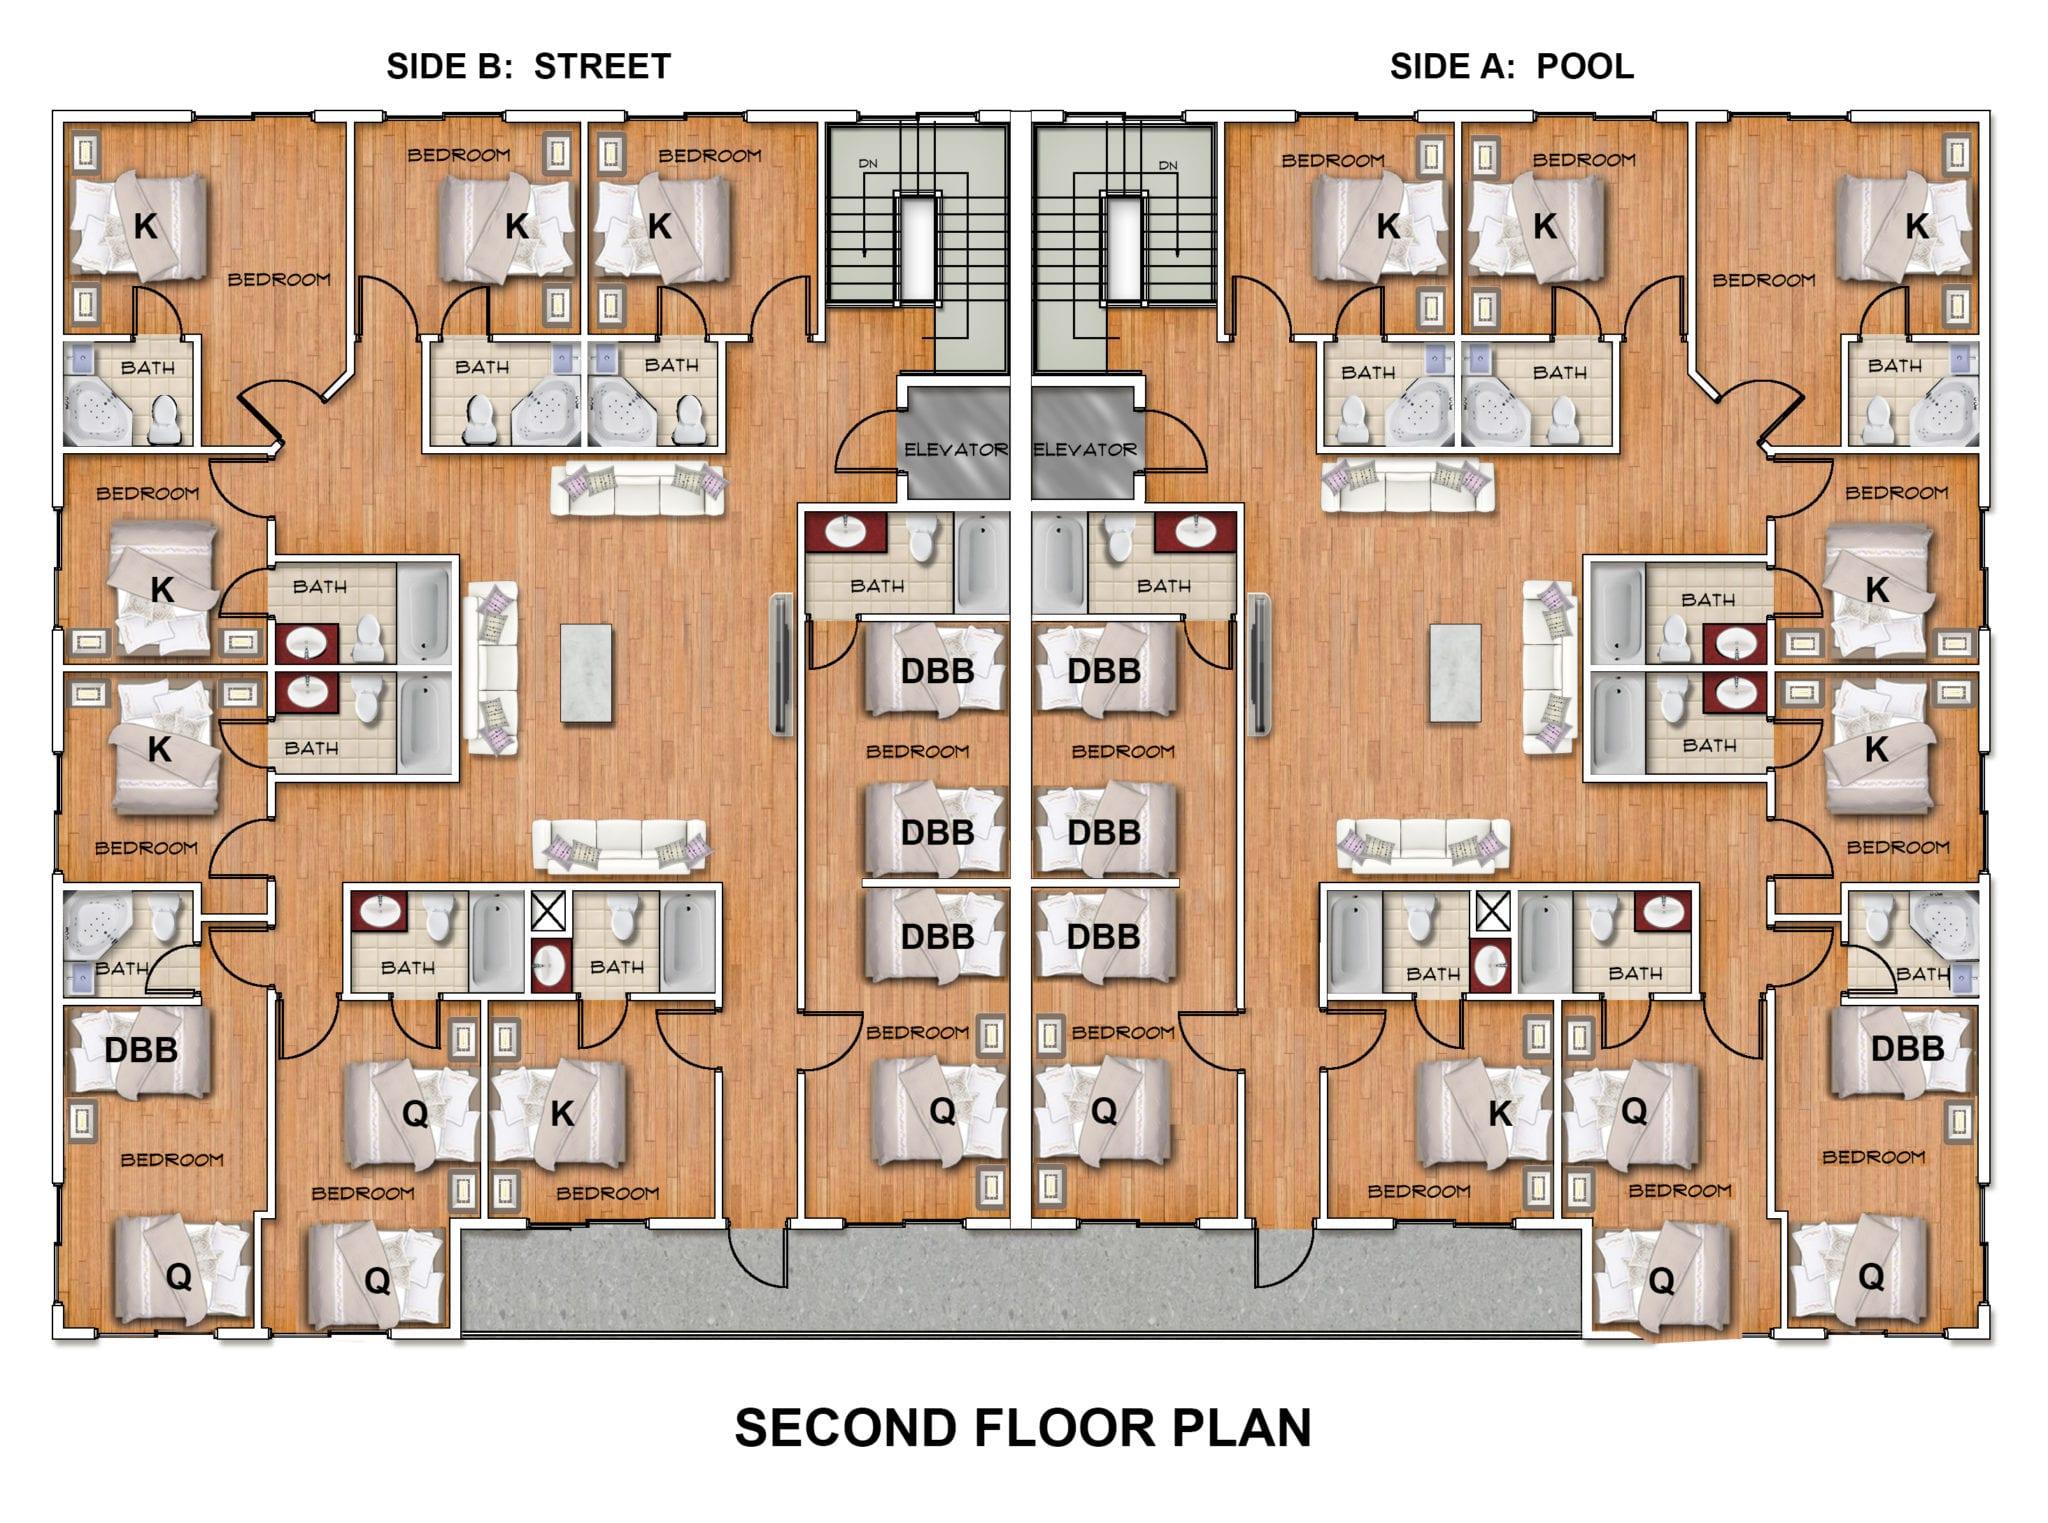 208 3rd Avenue second floor plan.